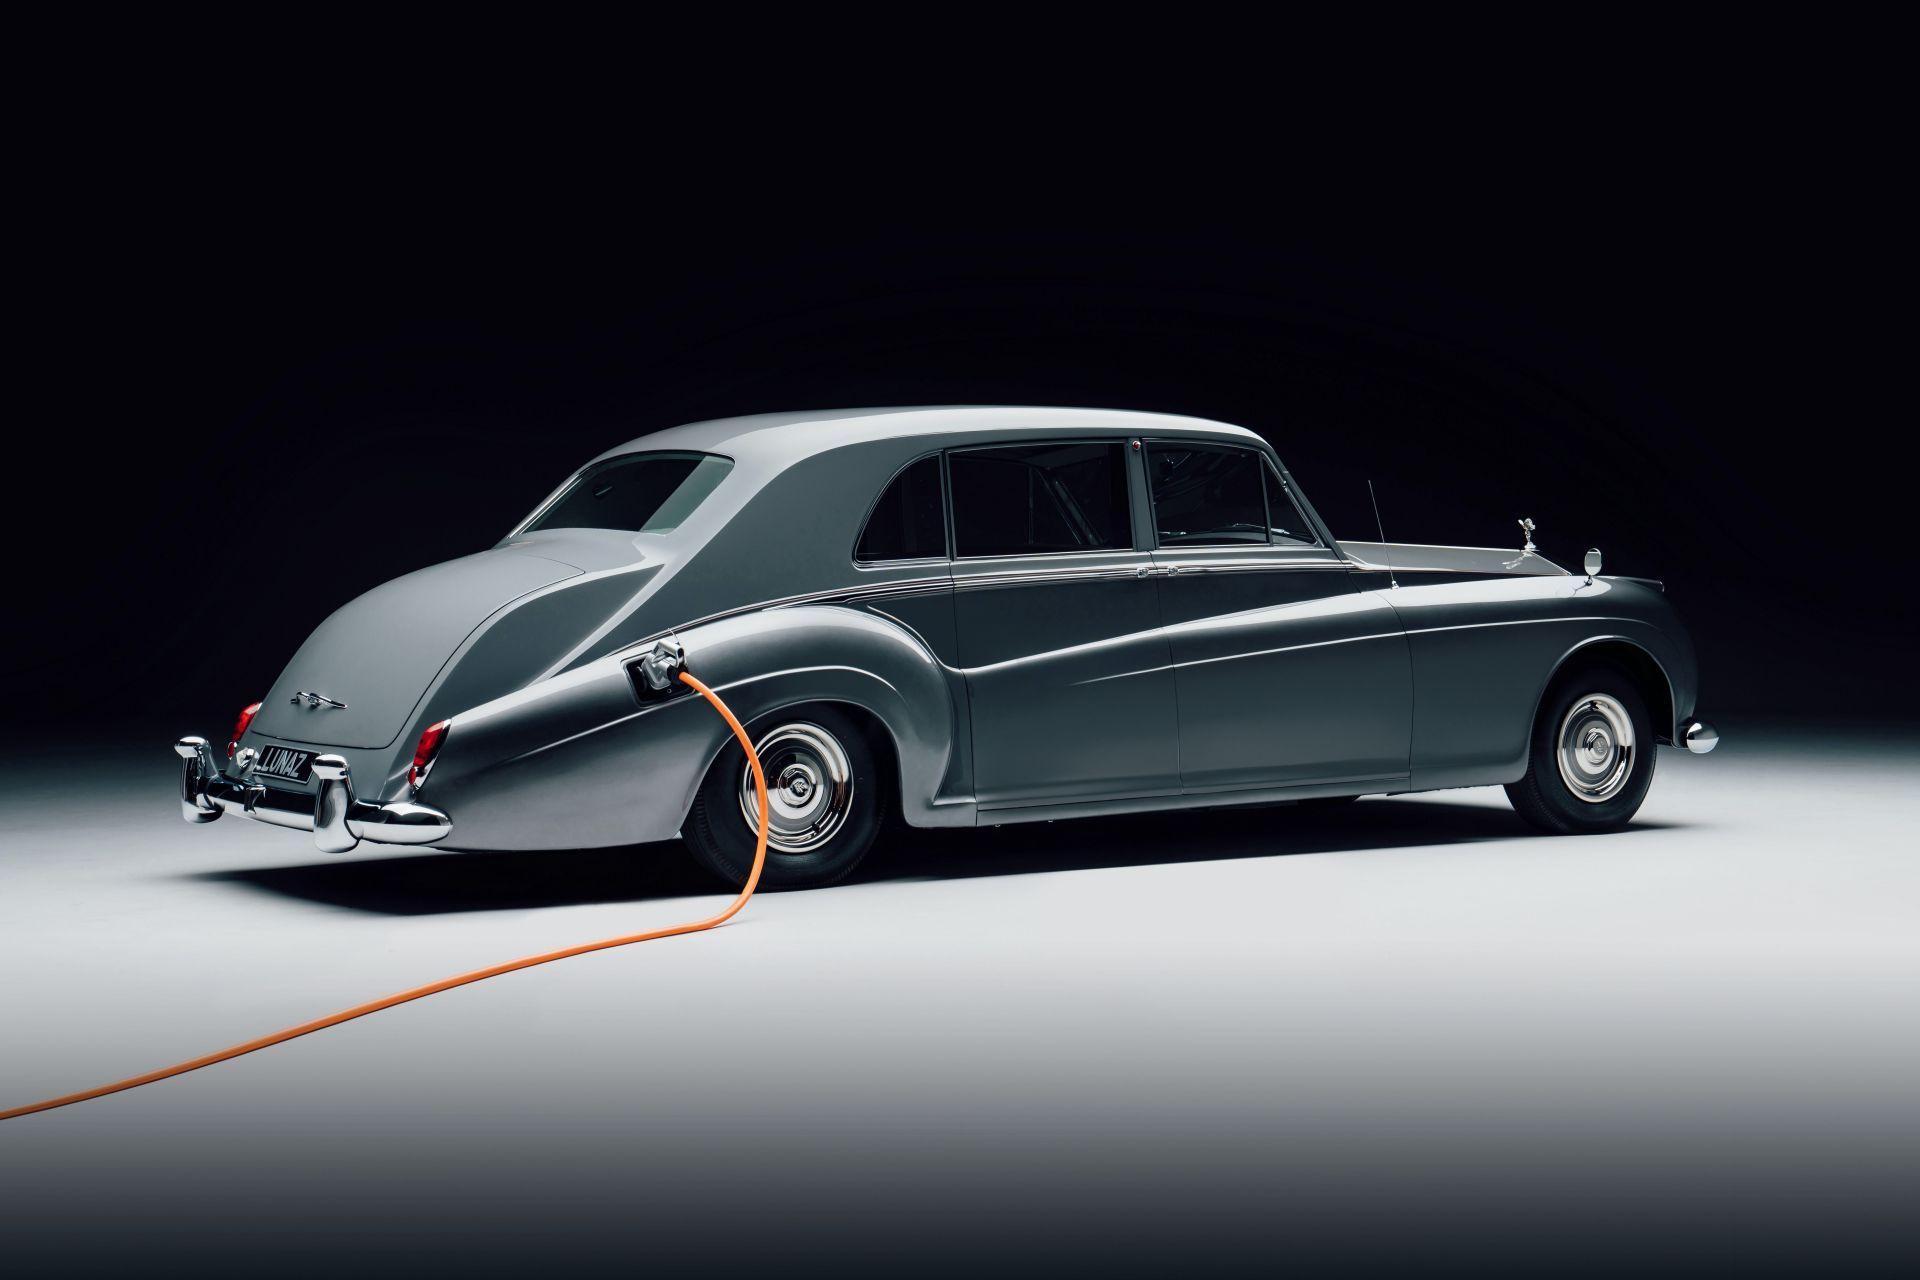 Electris-Rolls-Royce-Phantom-V-and-Silver-Cloud-by-Lunaz-19